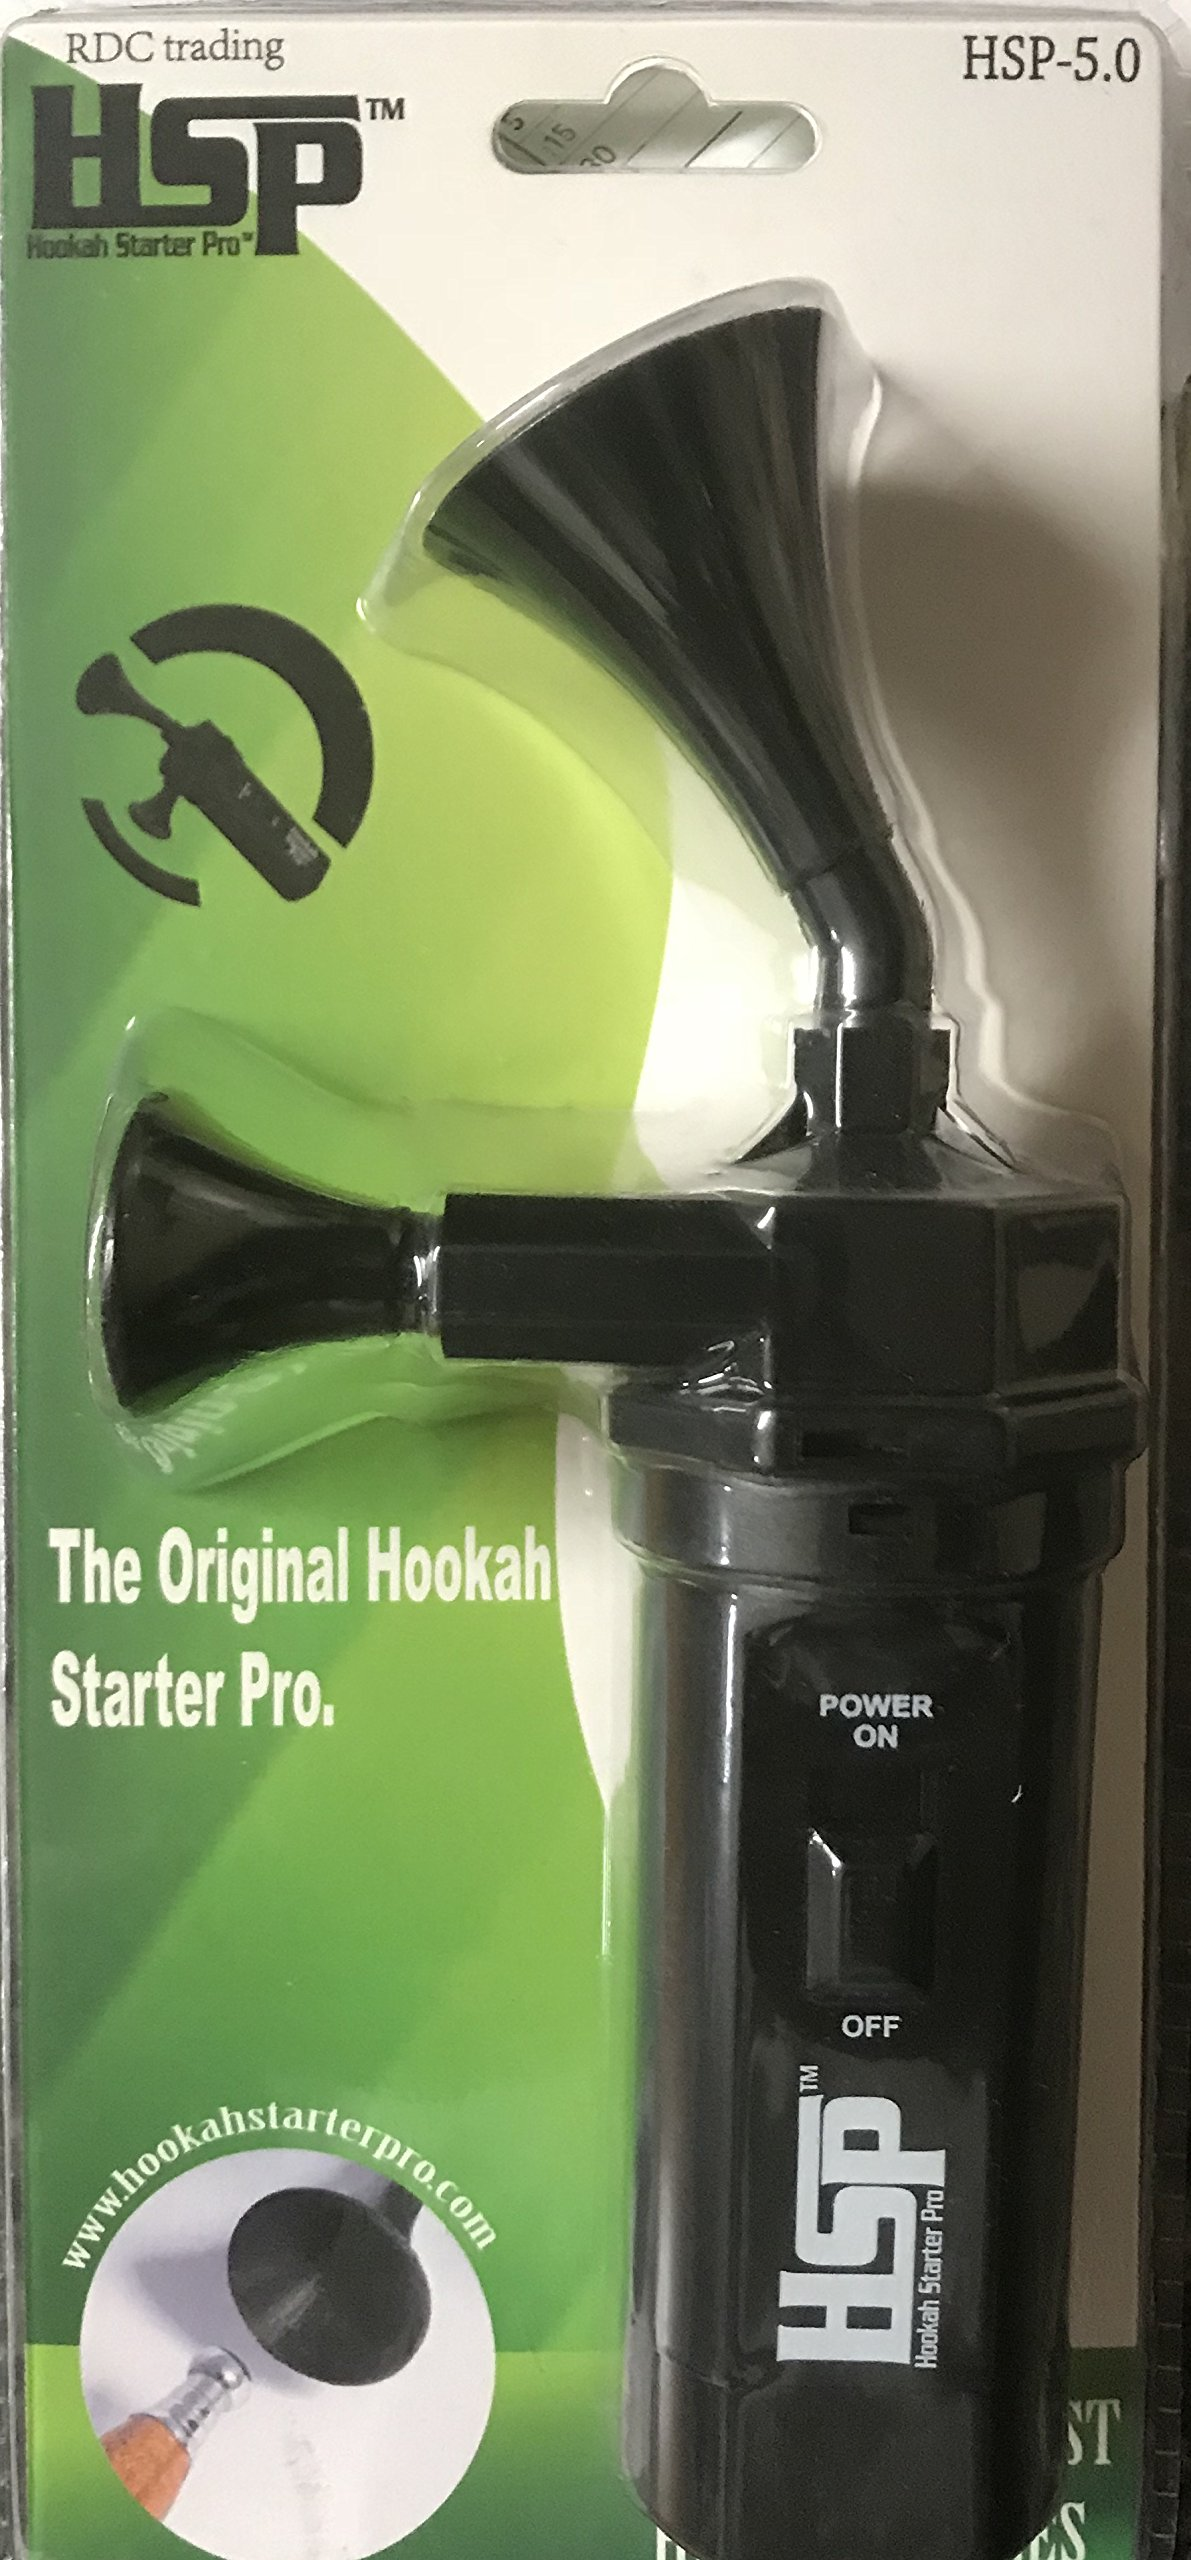 Hookah Starter Pro Version 2